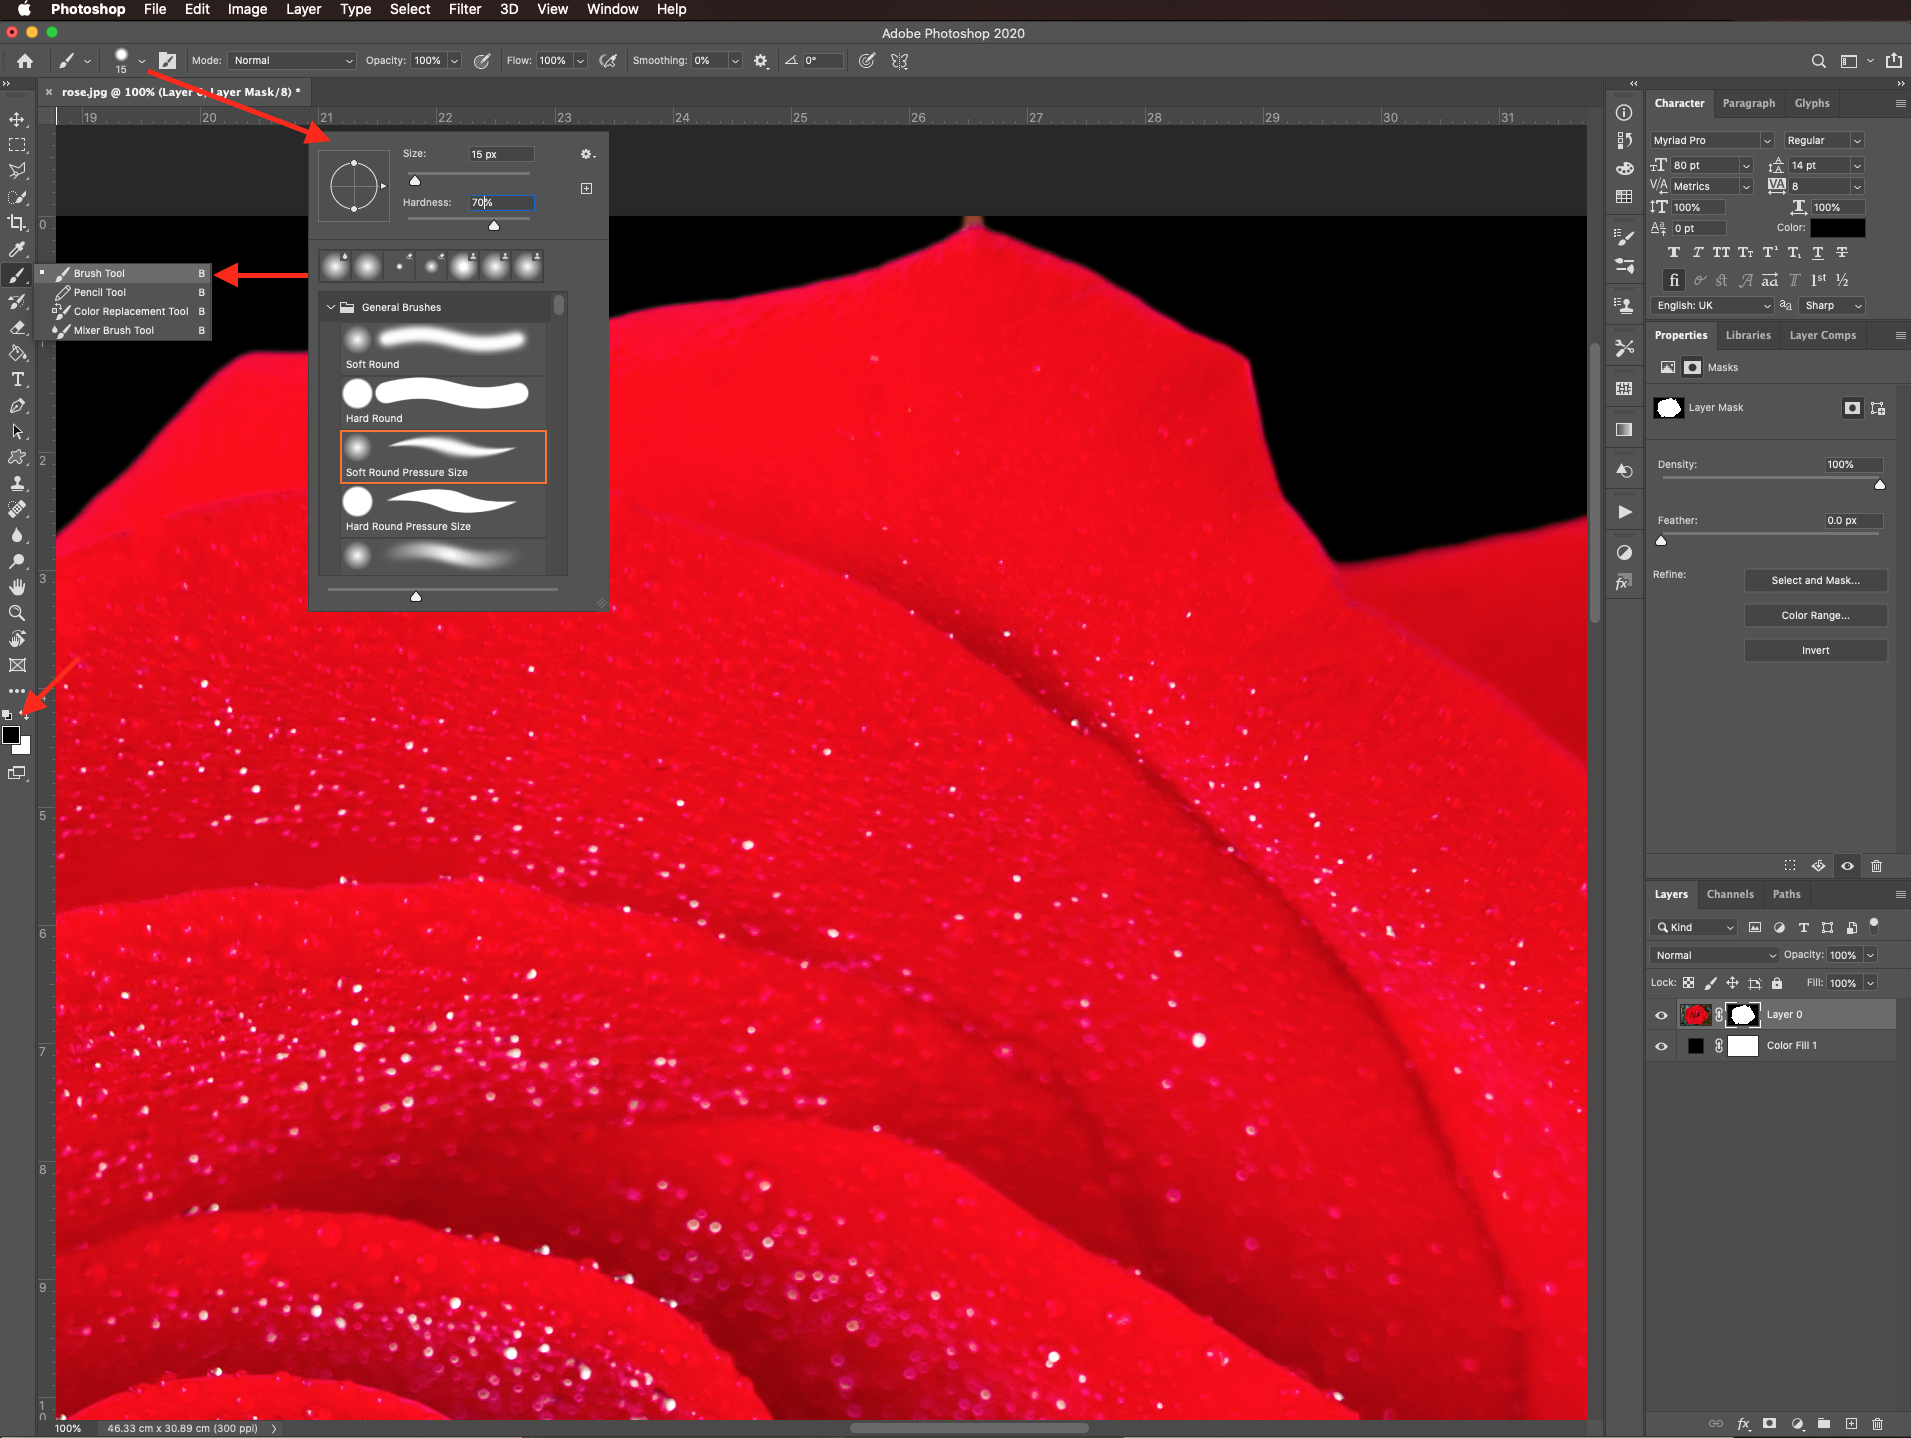 Brush settings in Photoshop